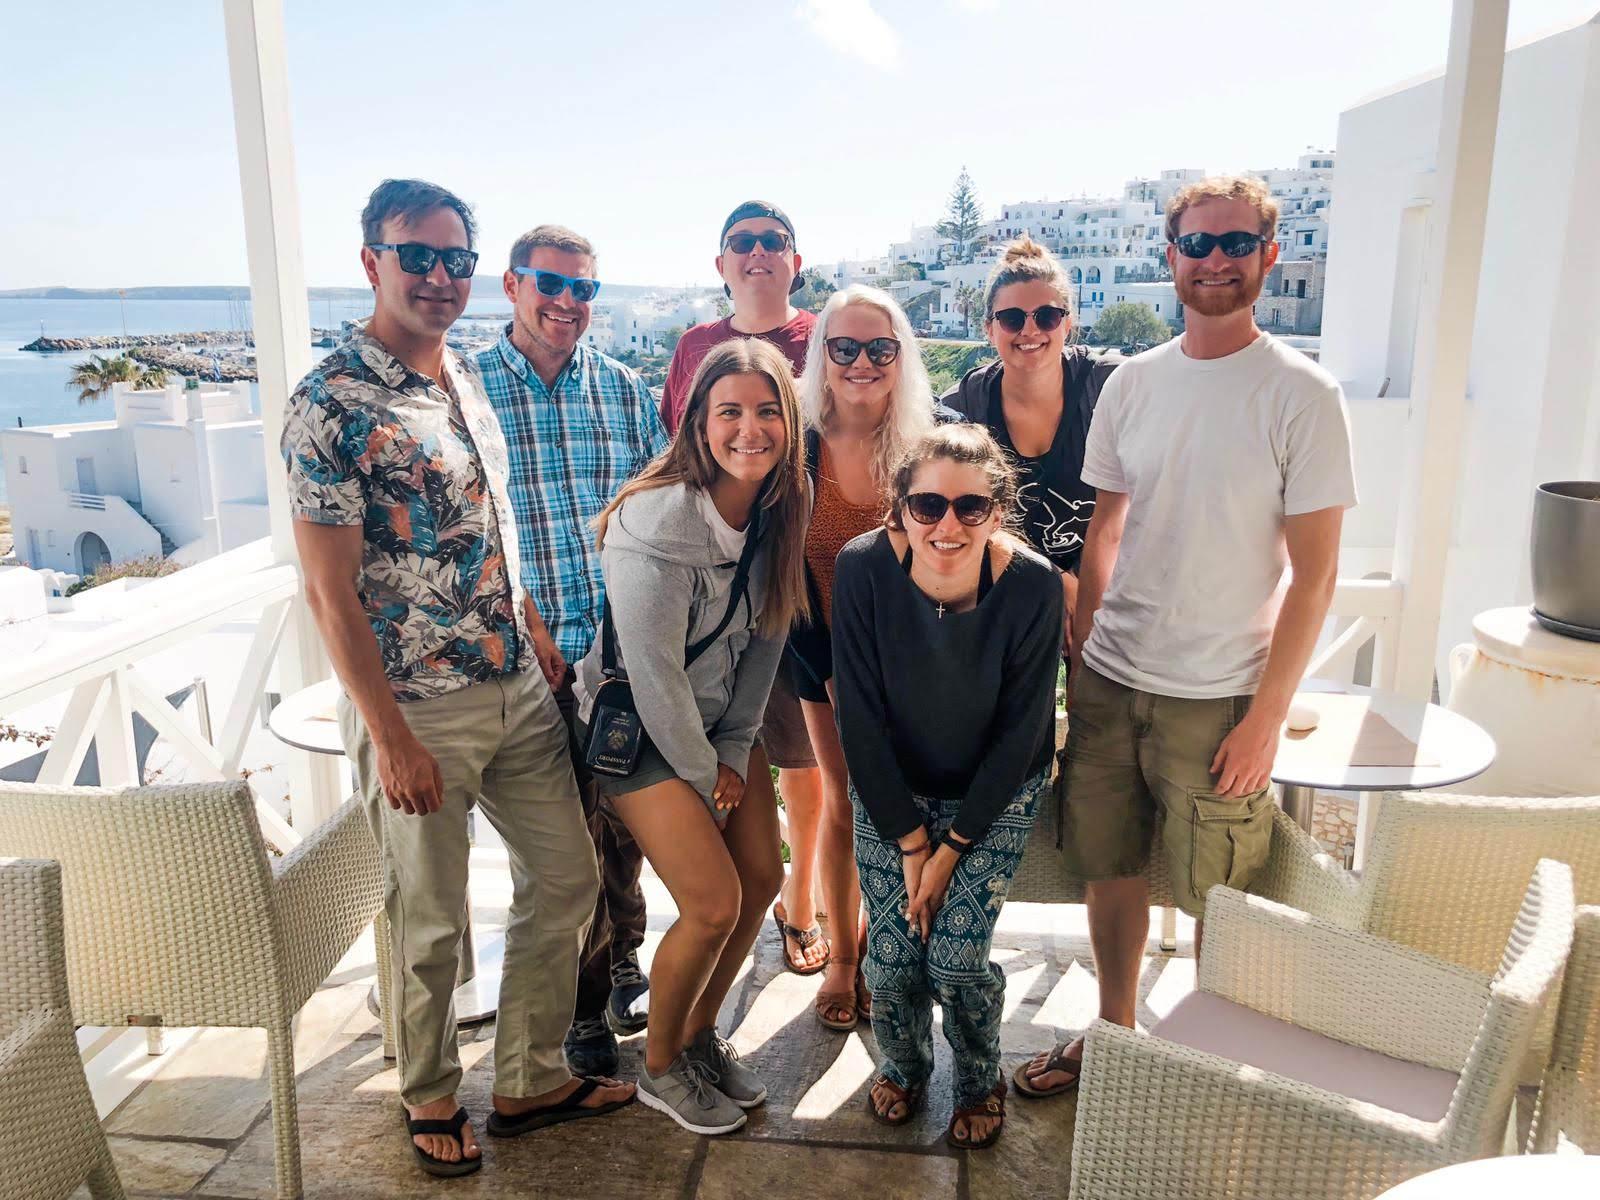 Team Serifos (minus Skipper Mark) — A.K.A. my best friends for the week.